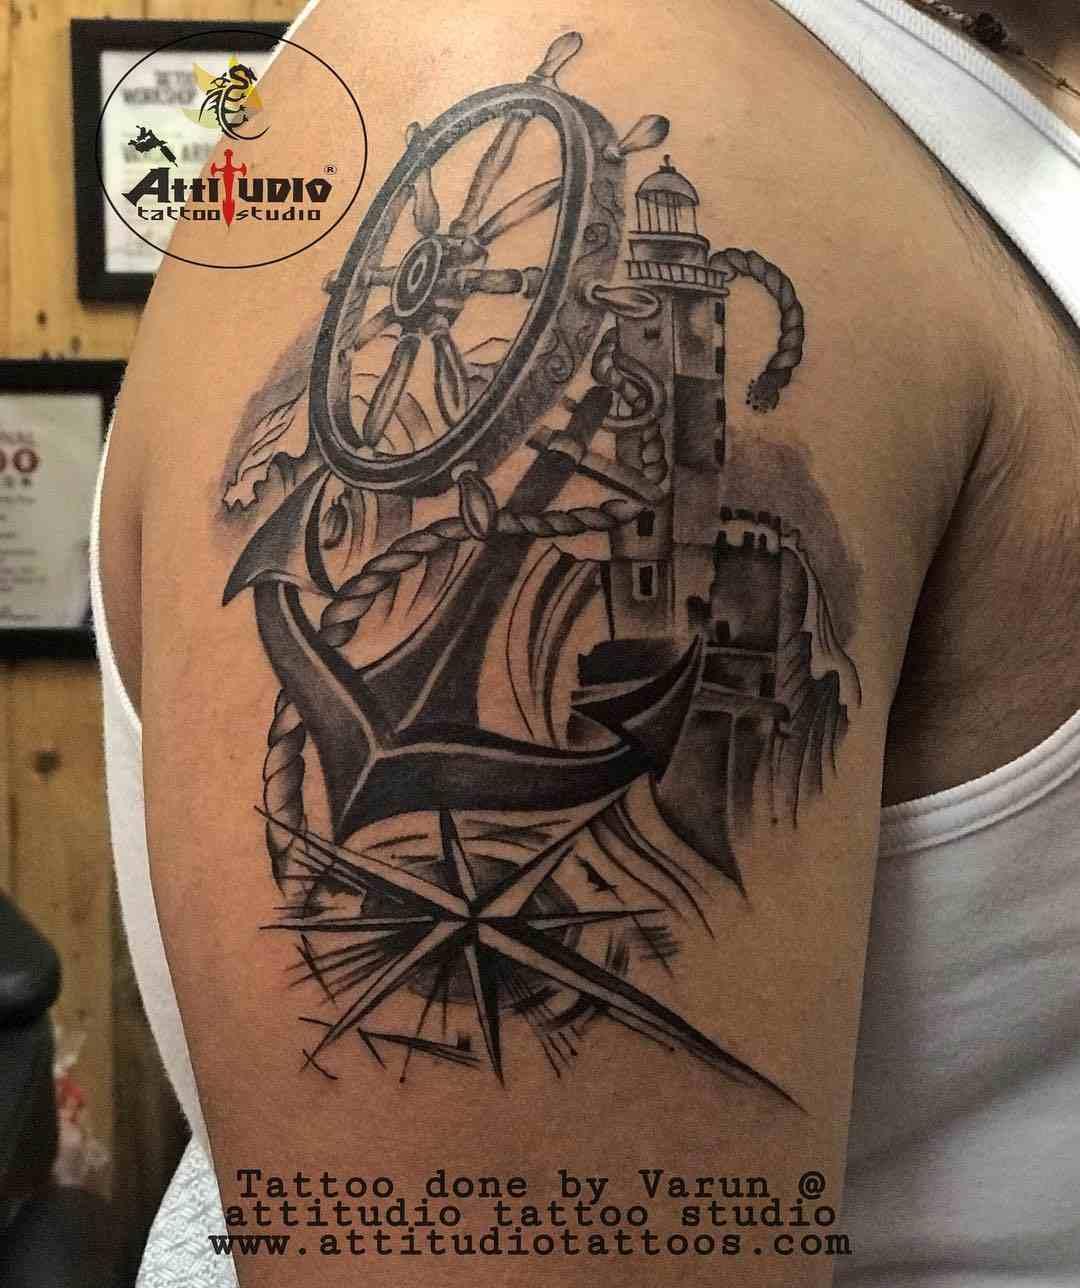 attitudio-tattoo-delhi-shoulder-awesome-tattoo